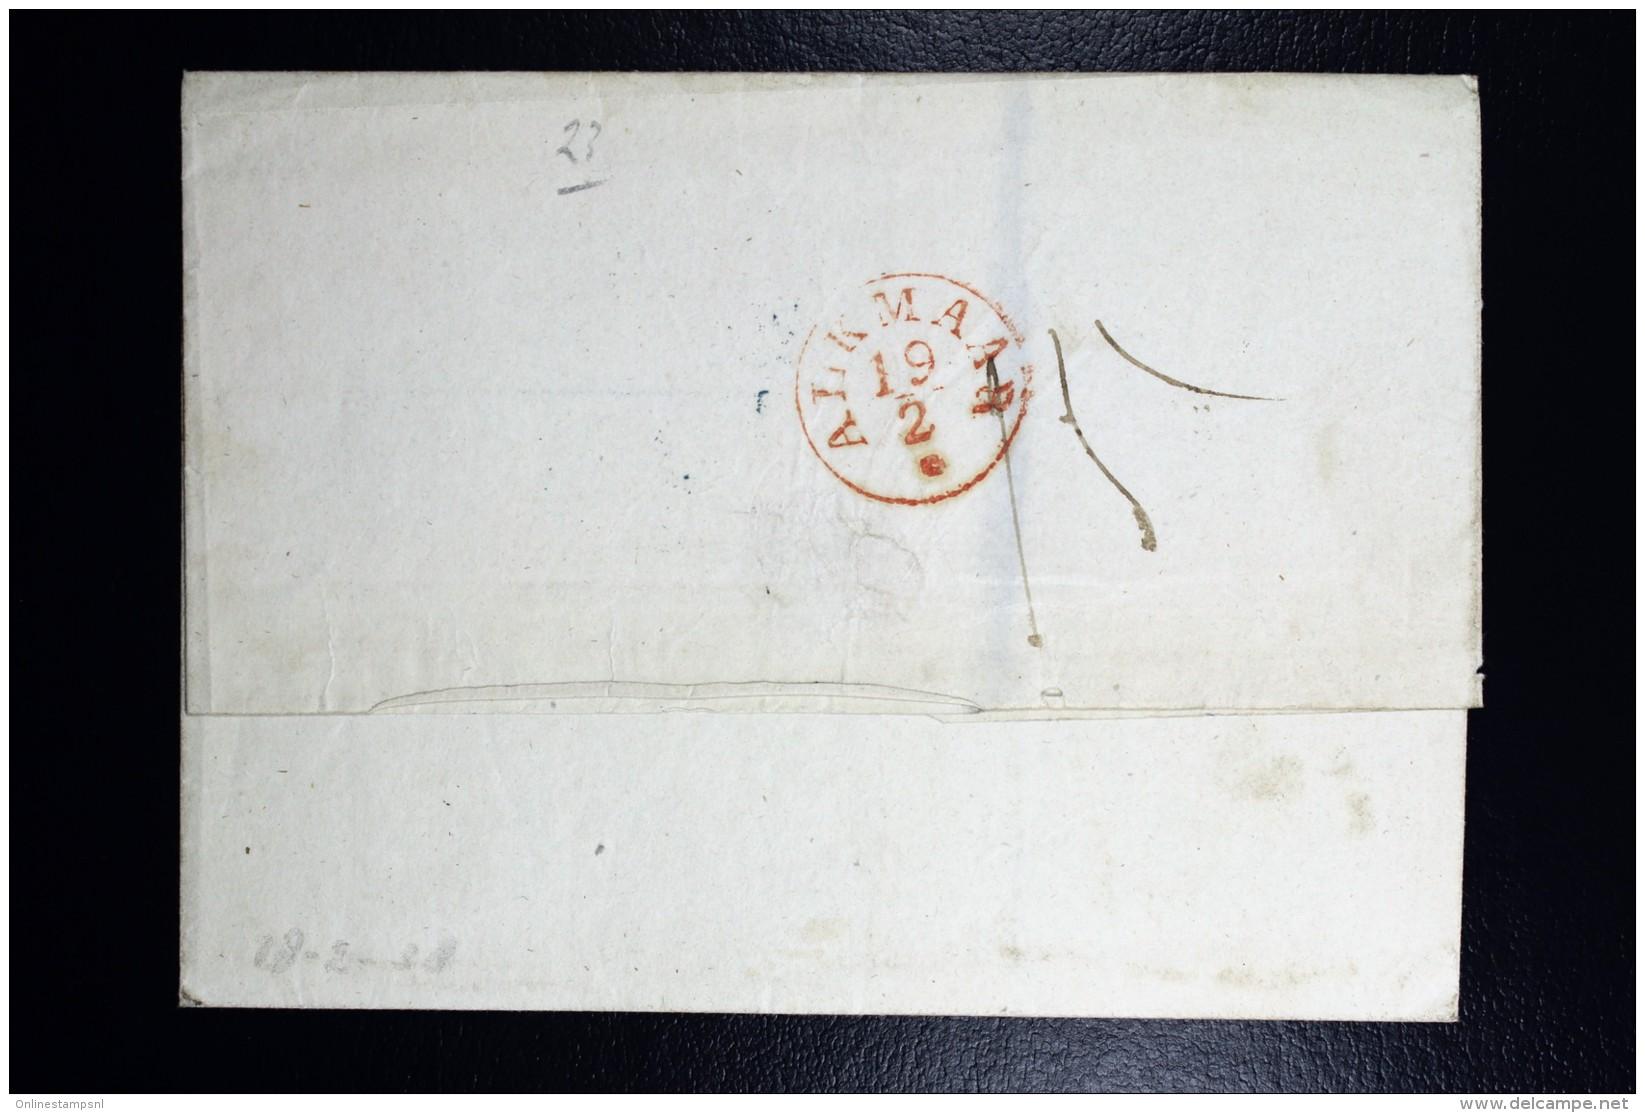 Cover 1836 Franco Boven, Amsterdam Naar Oud Karspel Op Langedijk Via Alkmaar - Niederlande